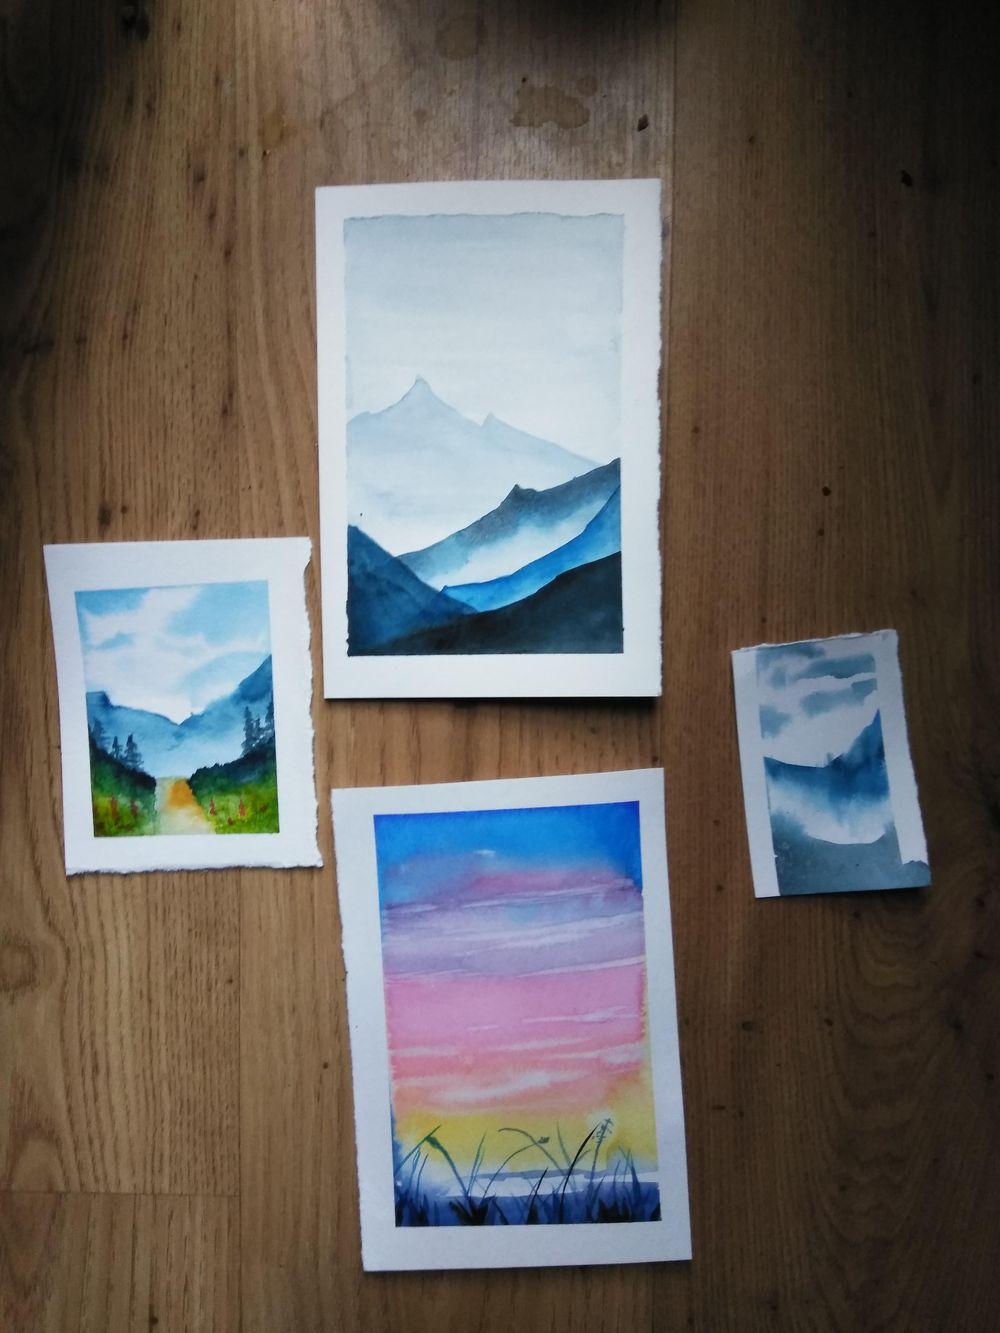 Landscape Watercolors - image 1 - student project